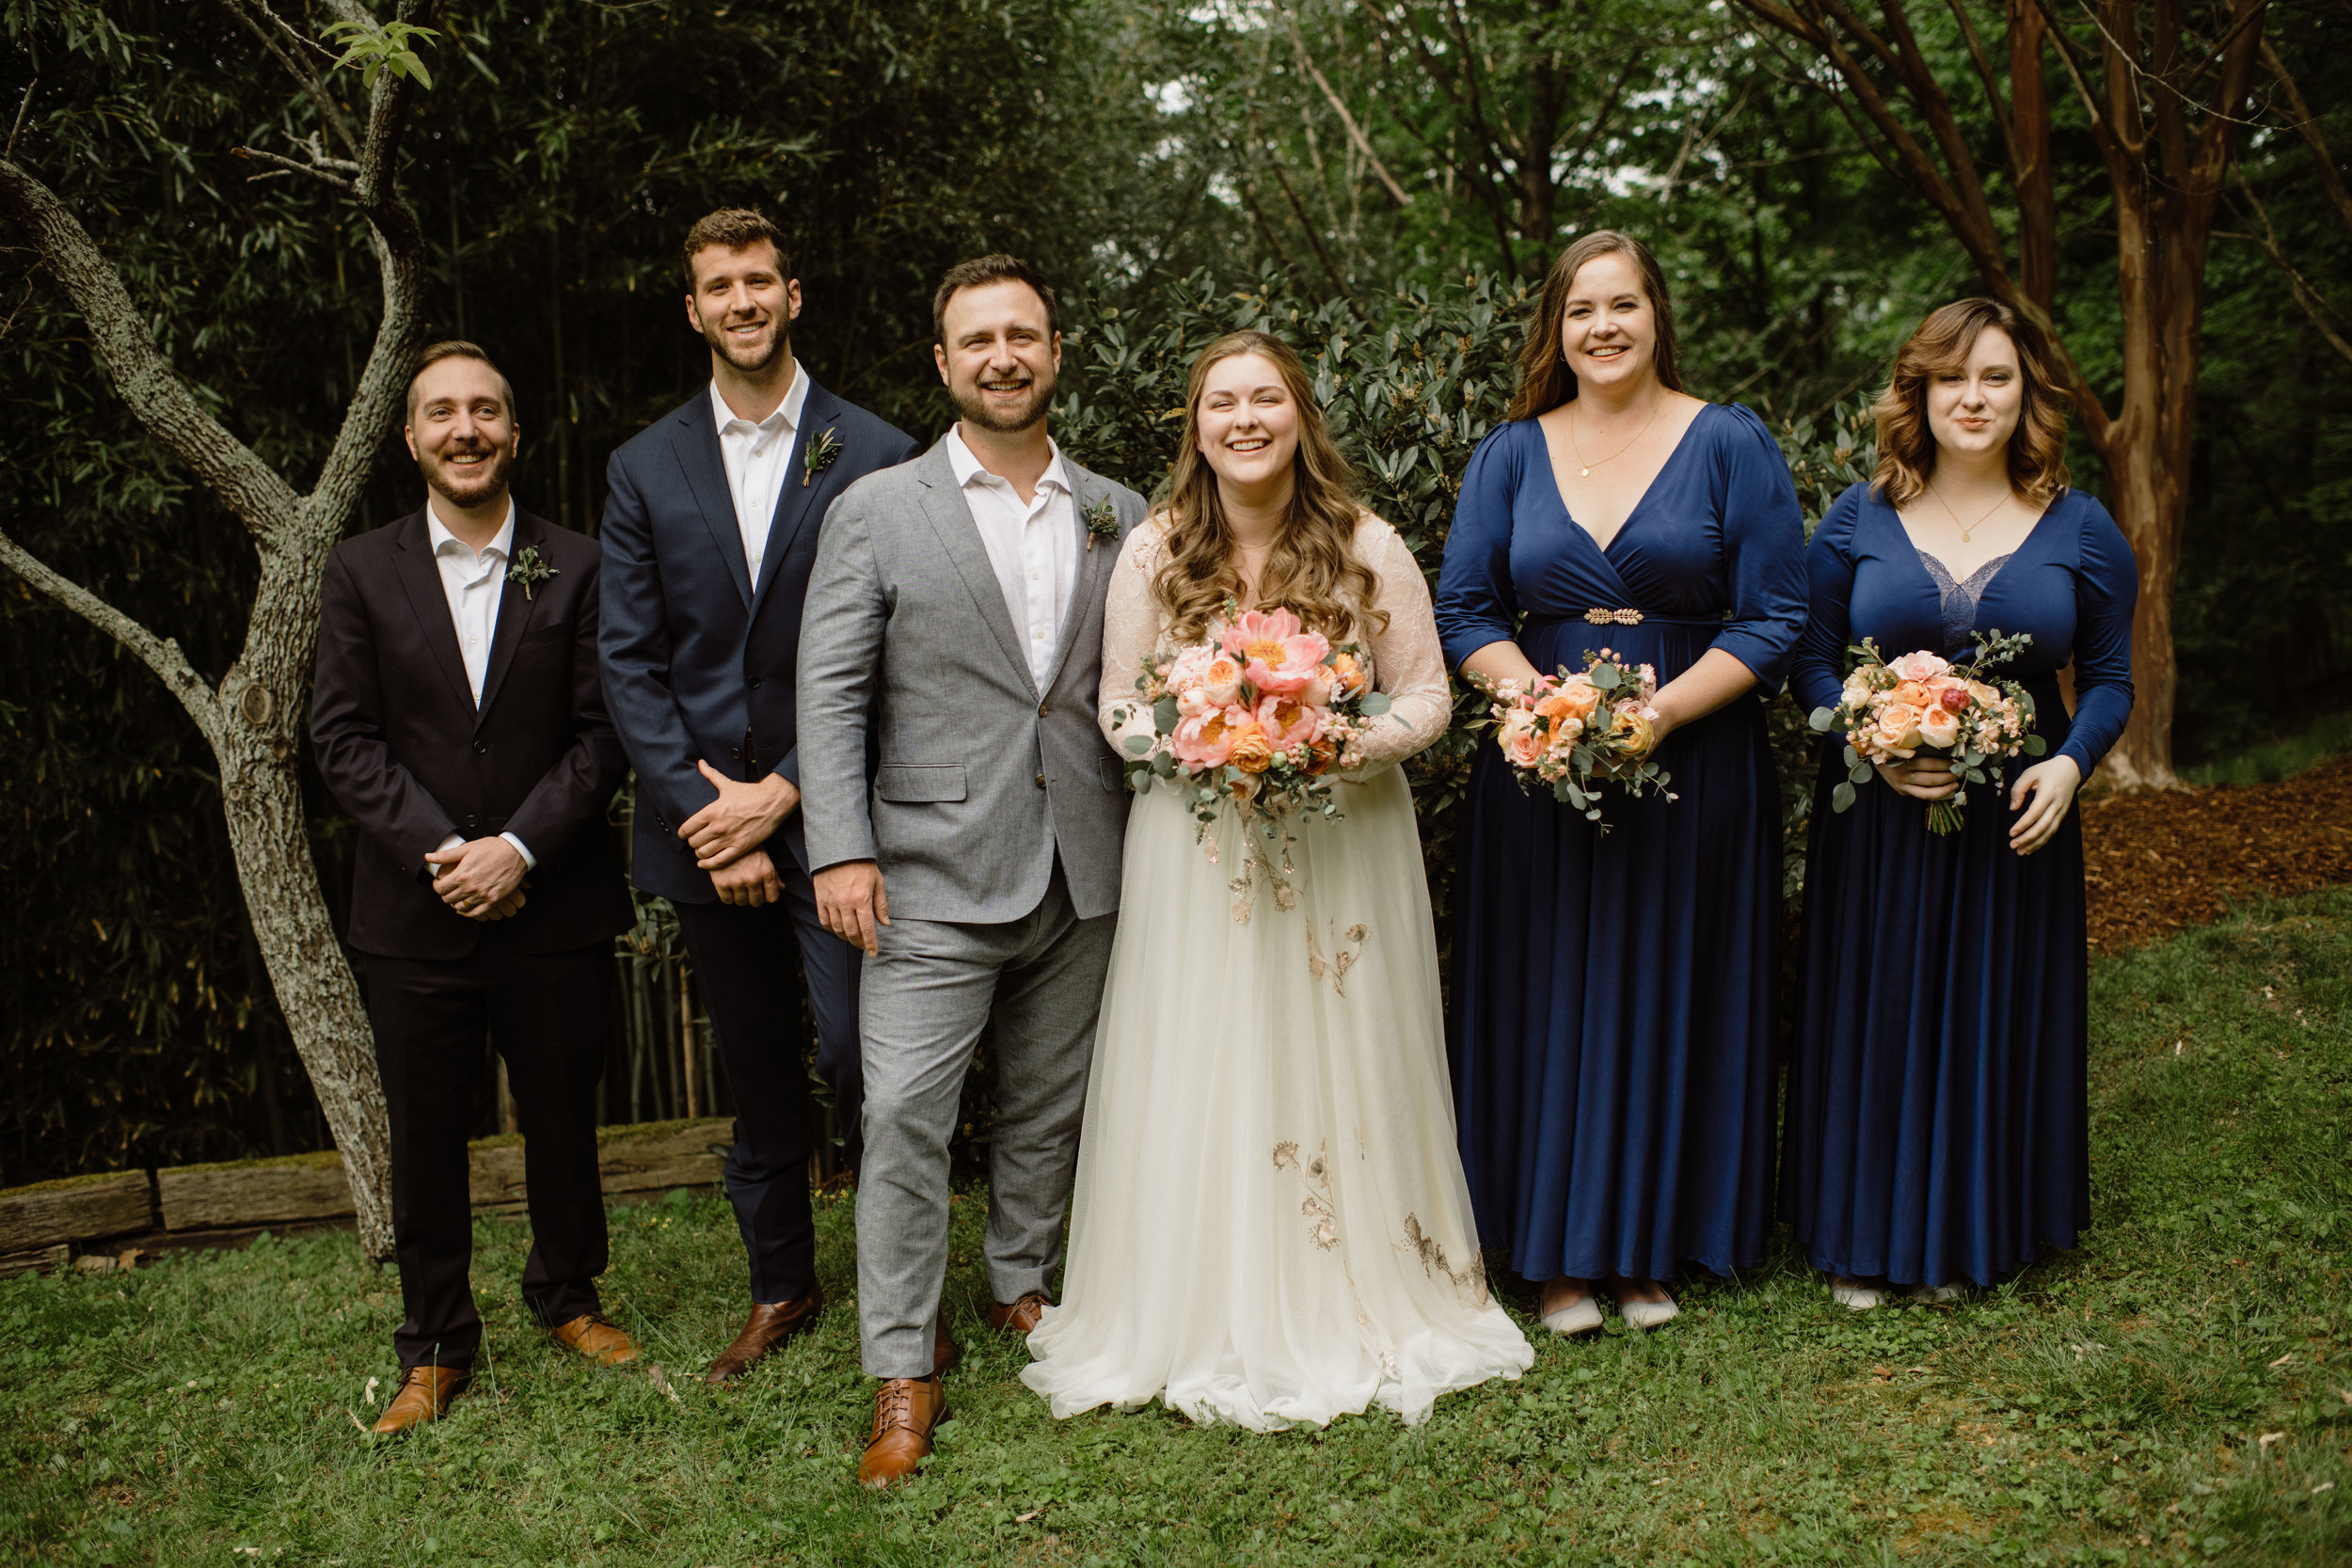 Elizabeth and Aldens Intimate Backyard wedding in Nashville Tennessee Wedding Photographer00007.jpg